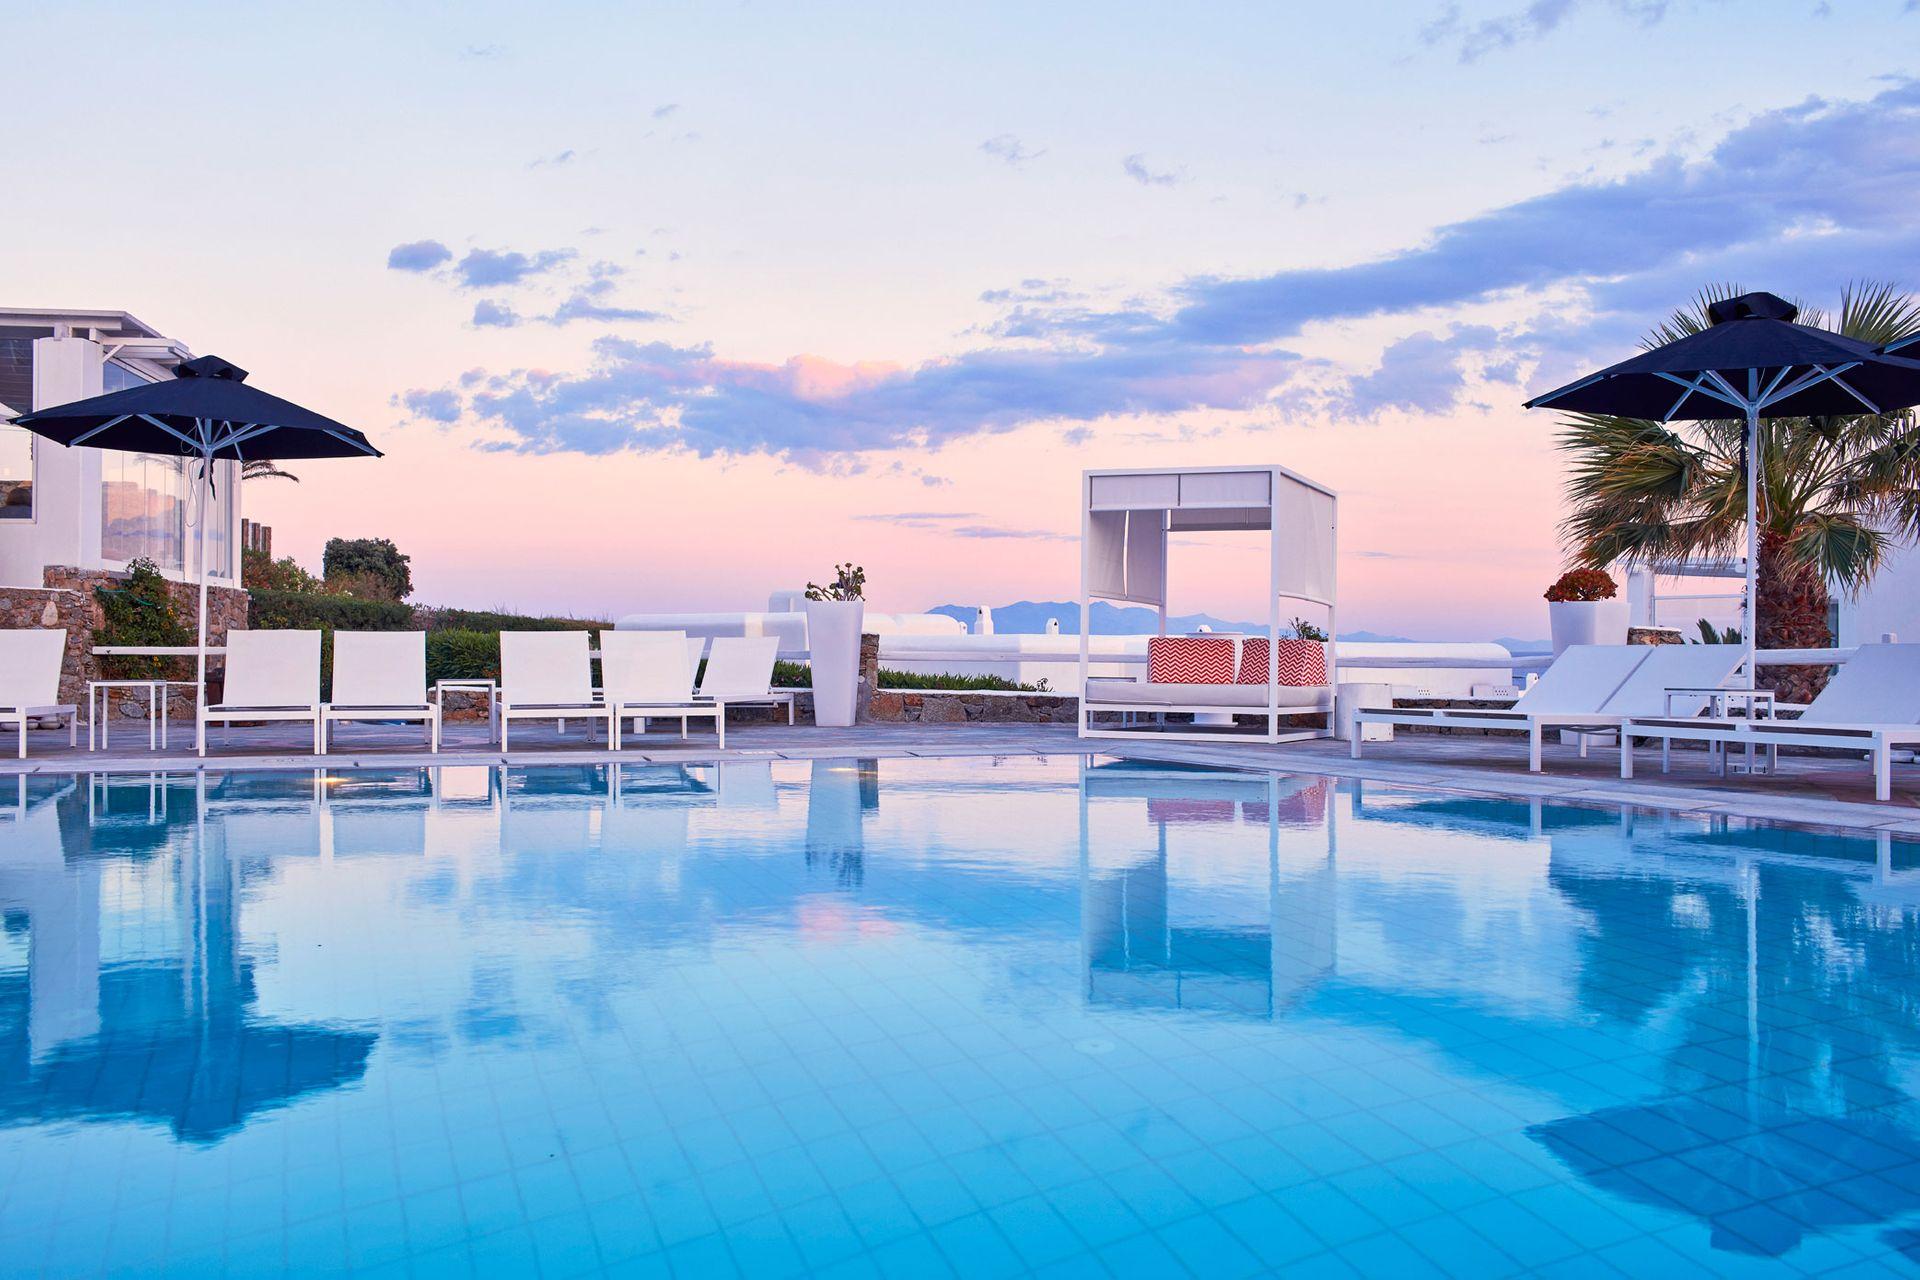 5* Archipelagos Hotel - Μύκονος ✦ 2 Ημέρες (1 Διανυκτέρευση) ✦ 2 άτομα ✦ Πρωινό ✦ 20/07/2020 έως 20/09/2020 ✦ Κοντά στην παραλία!